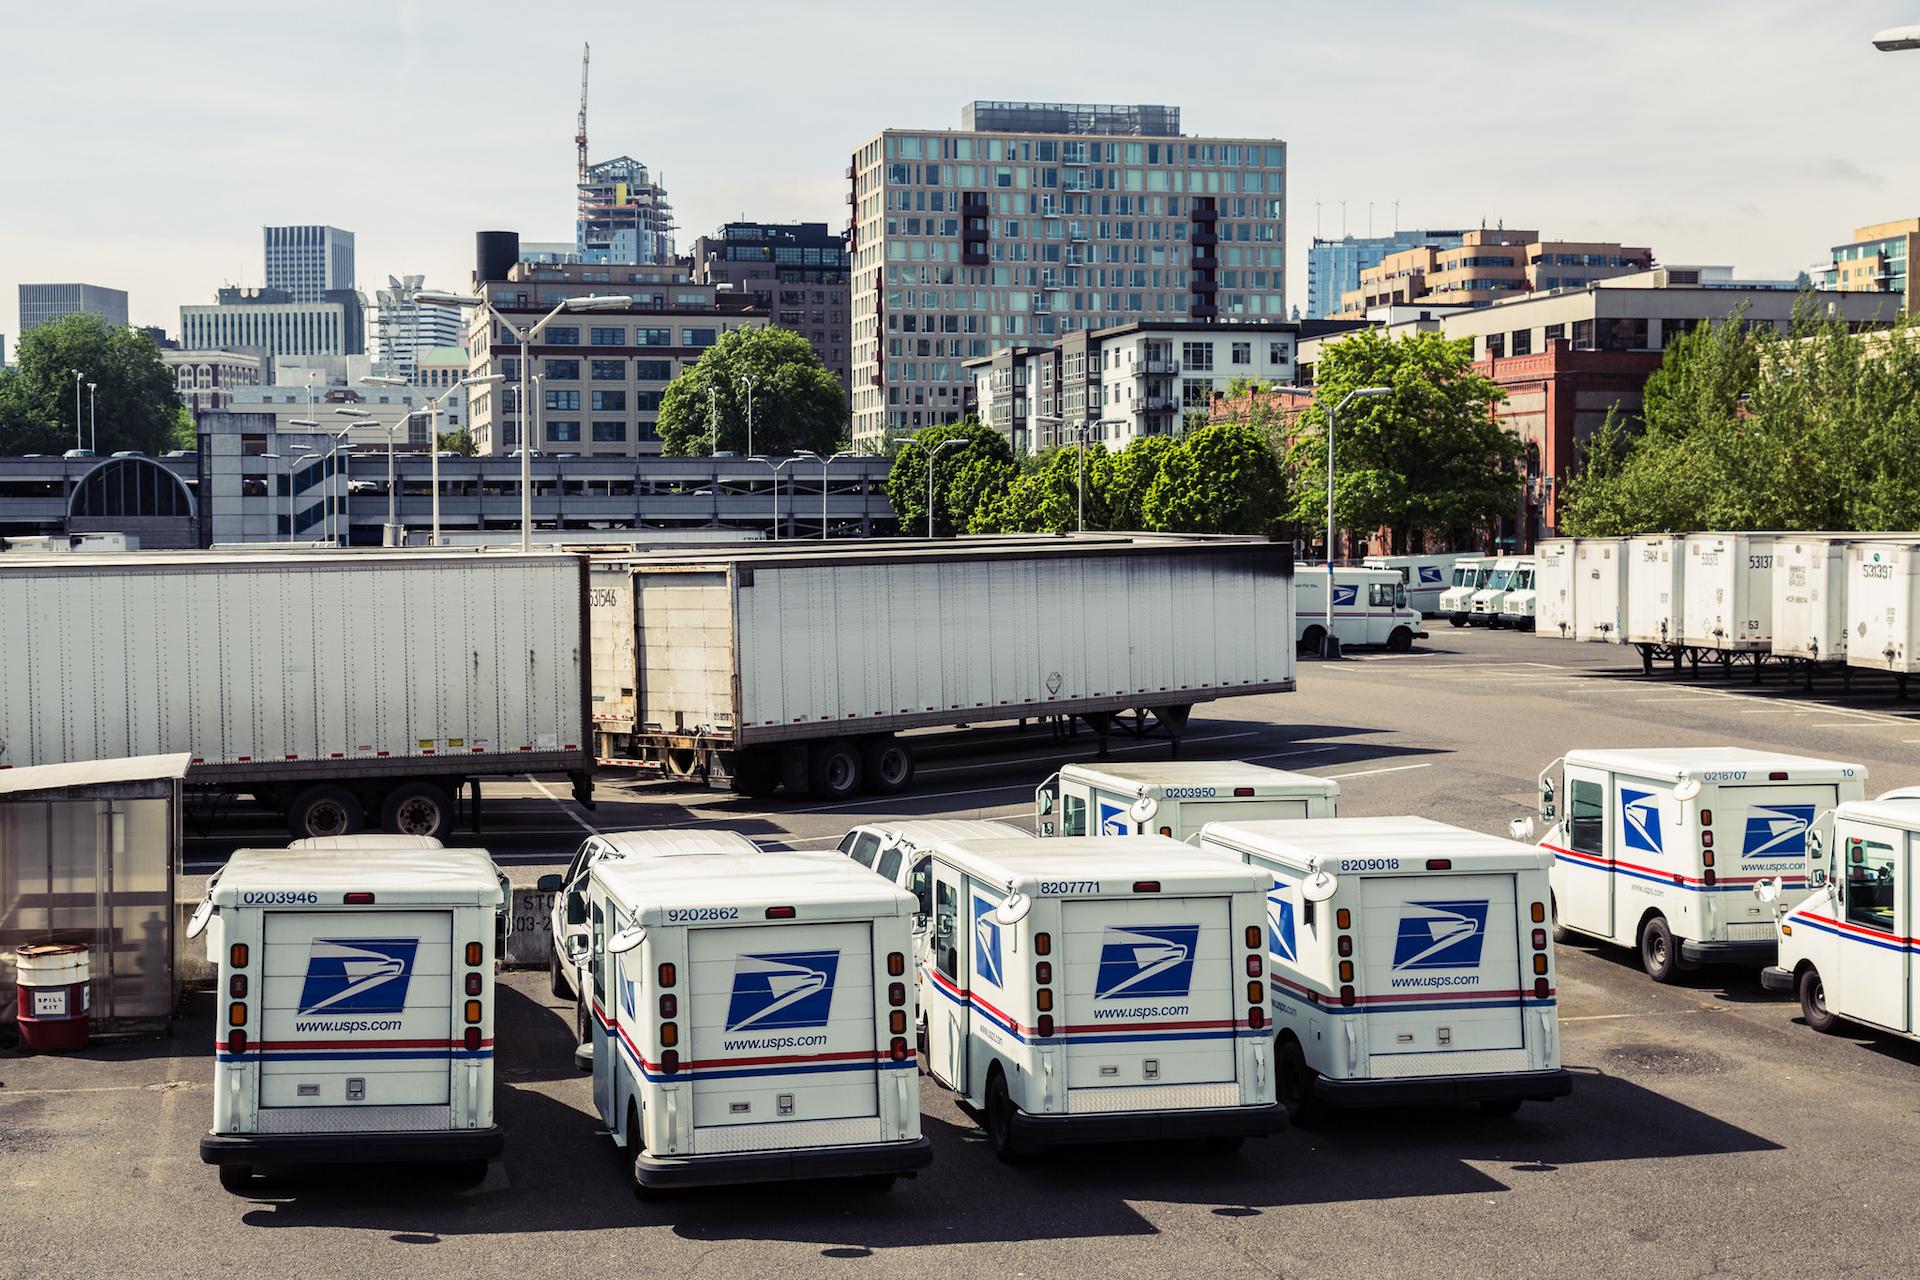 USPS, Postal Service, mail